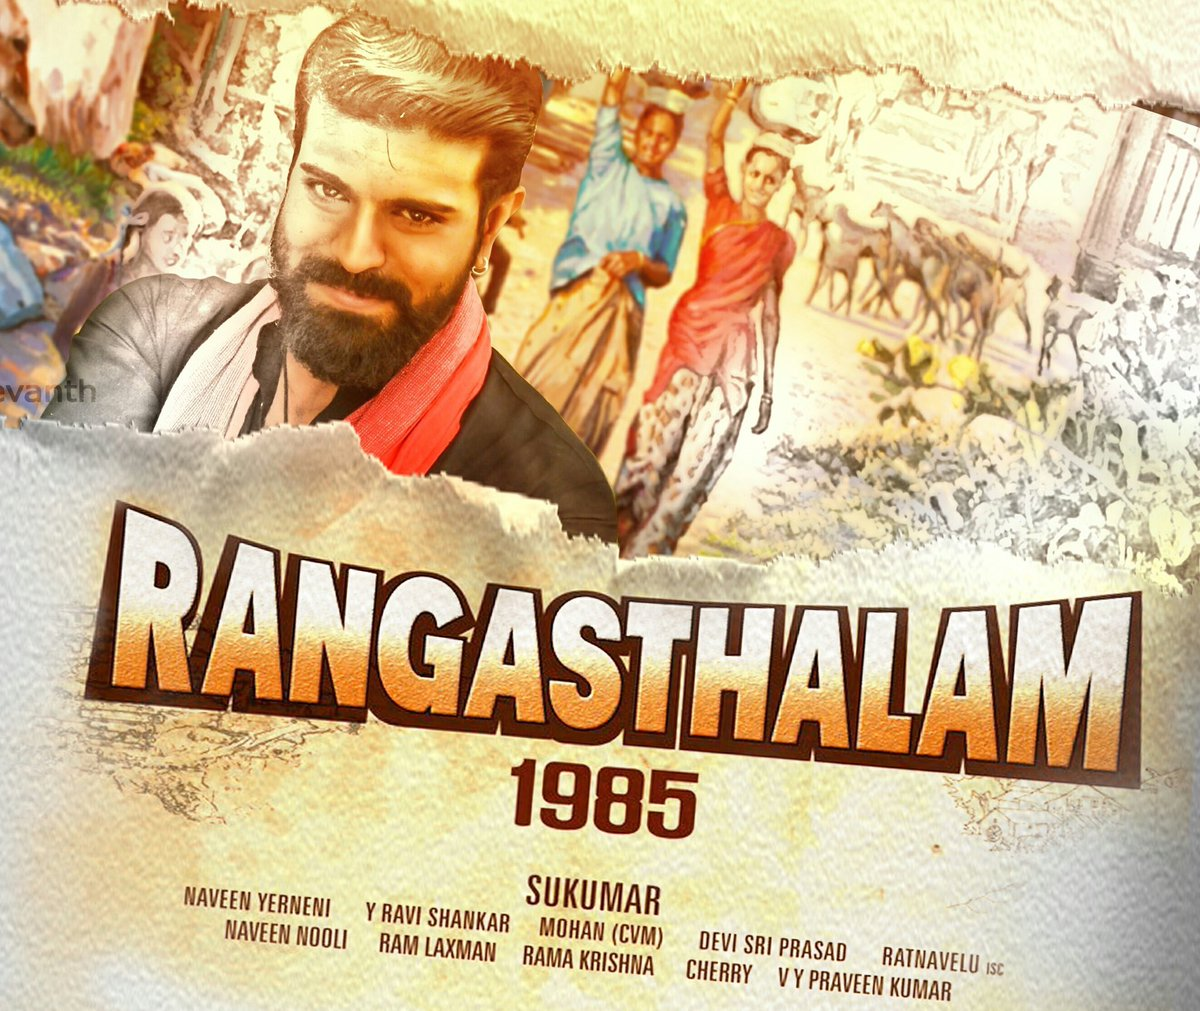 Rangasthalam Oriya Songs Download: Rangasthalam 2018 Telugu Full Movie Download